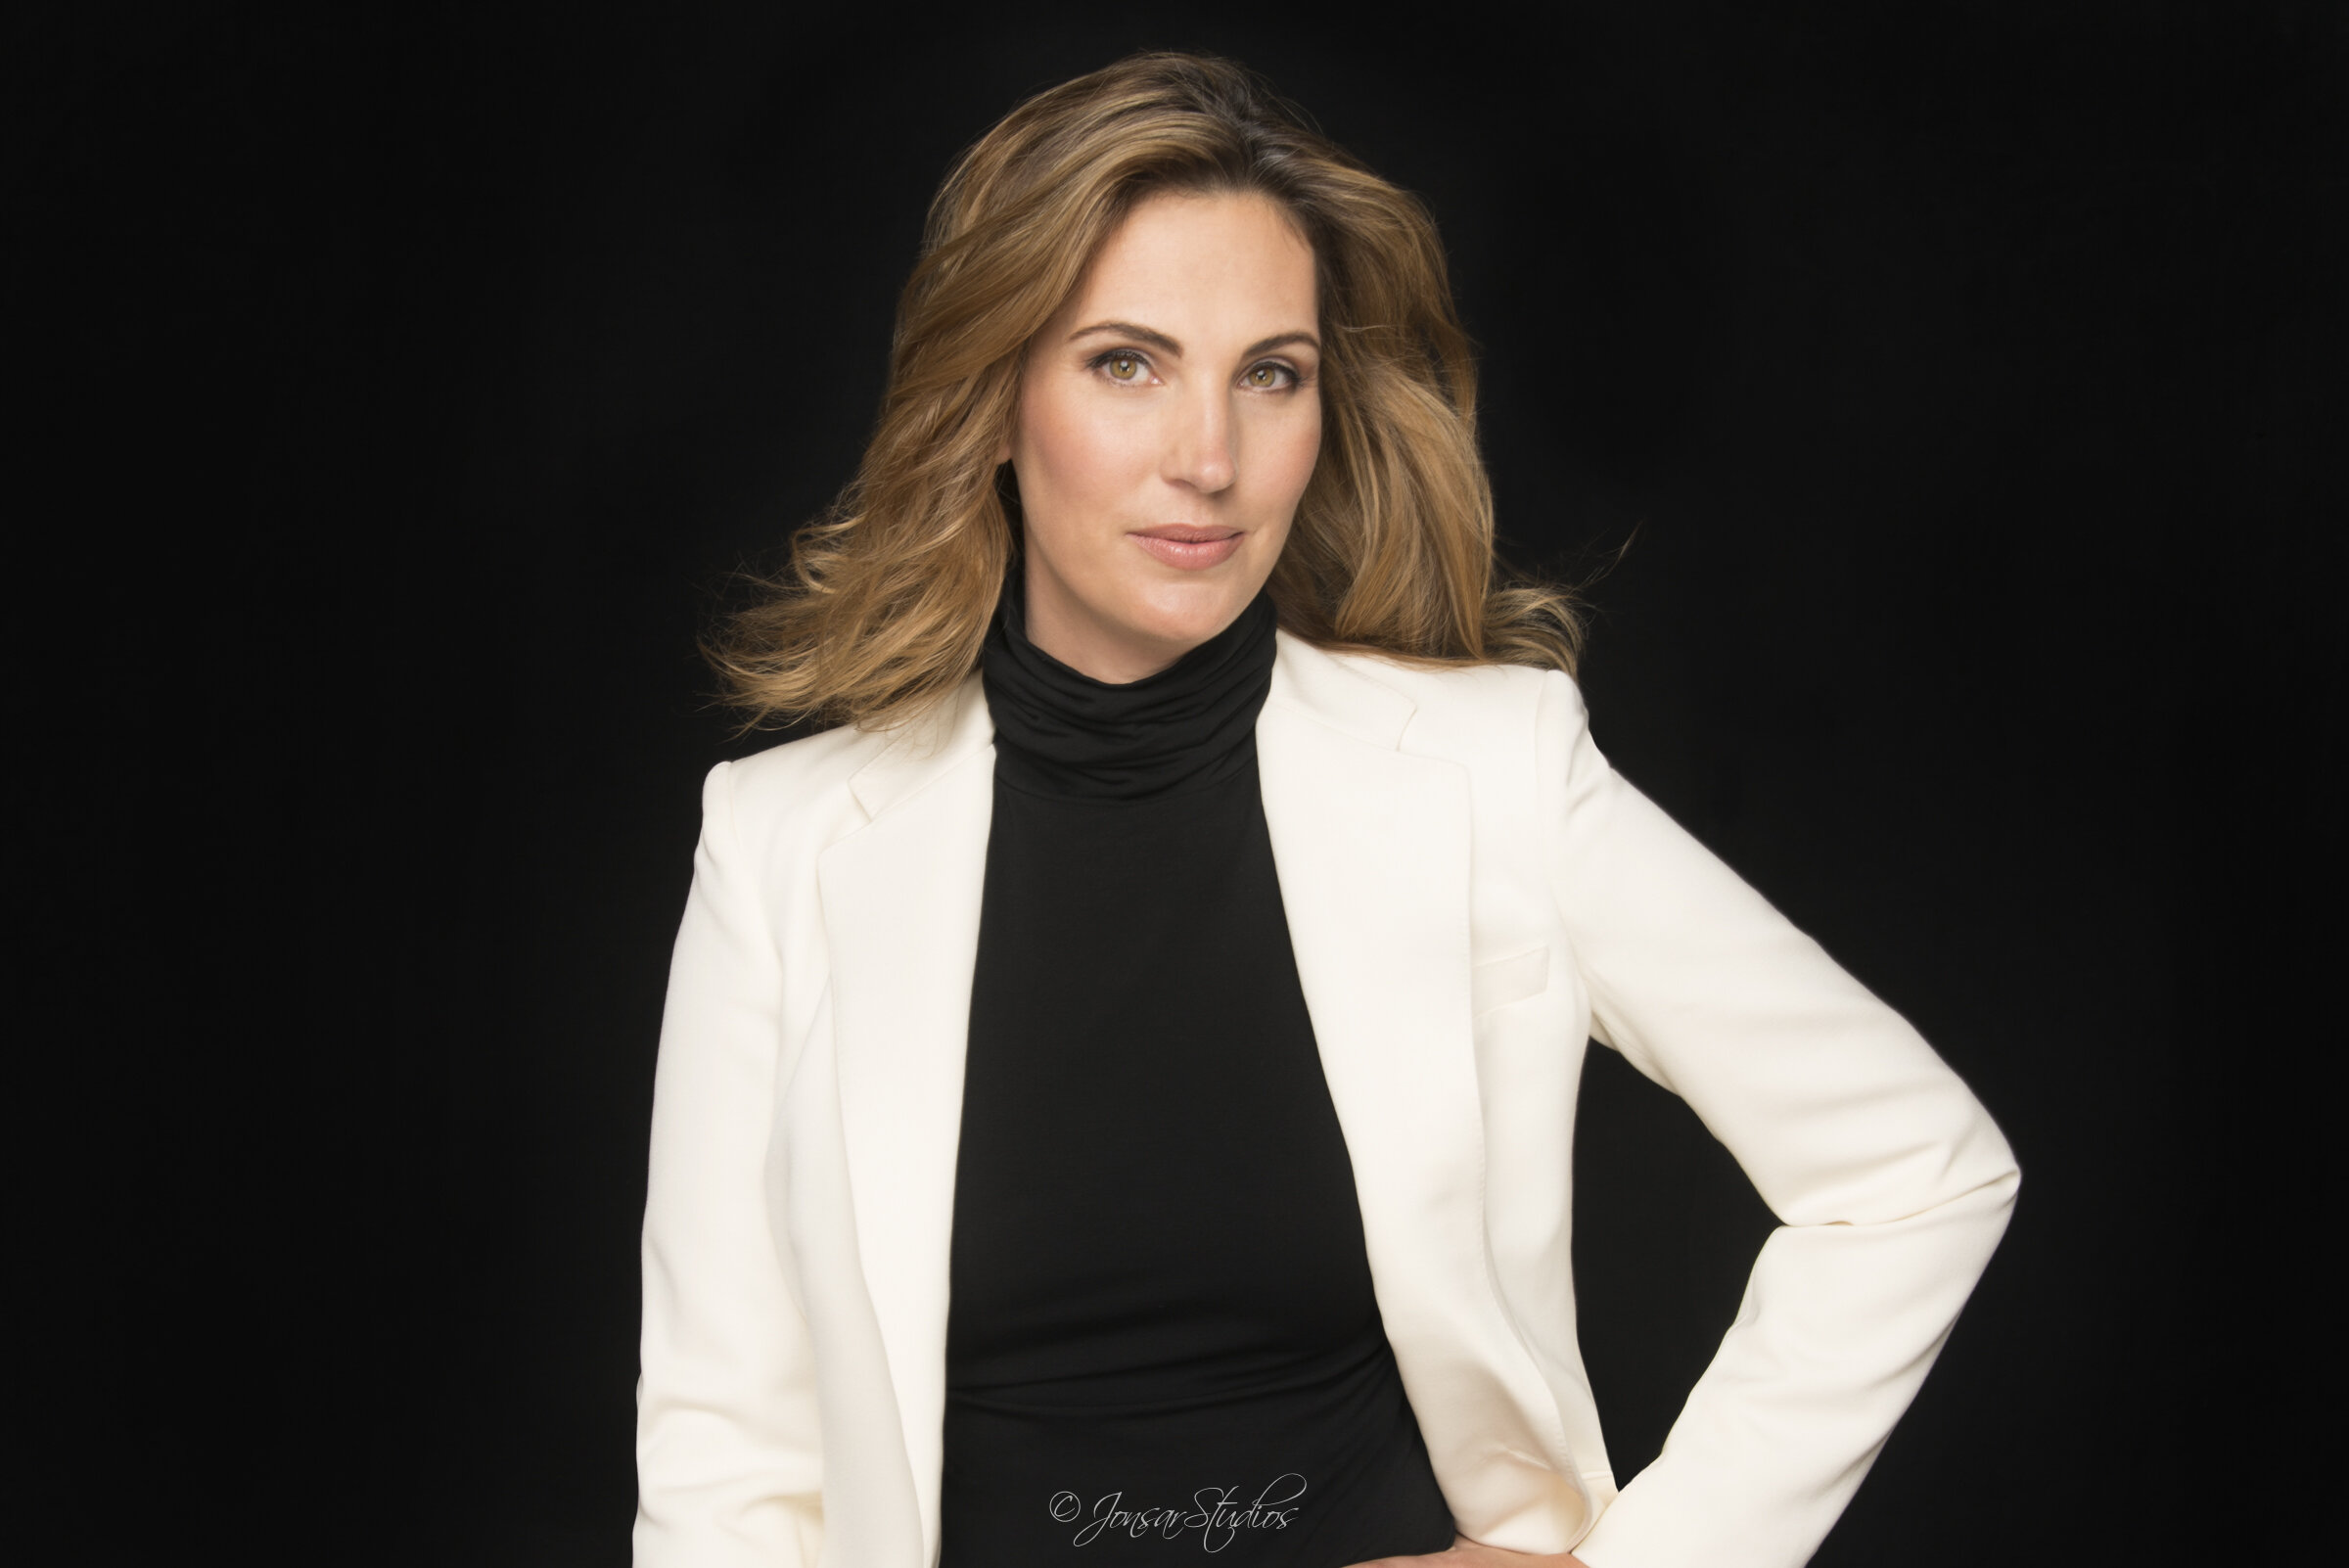 Corporate Headshot of Executive Woman on Black Background